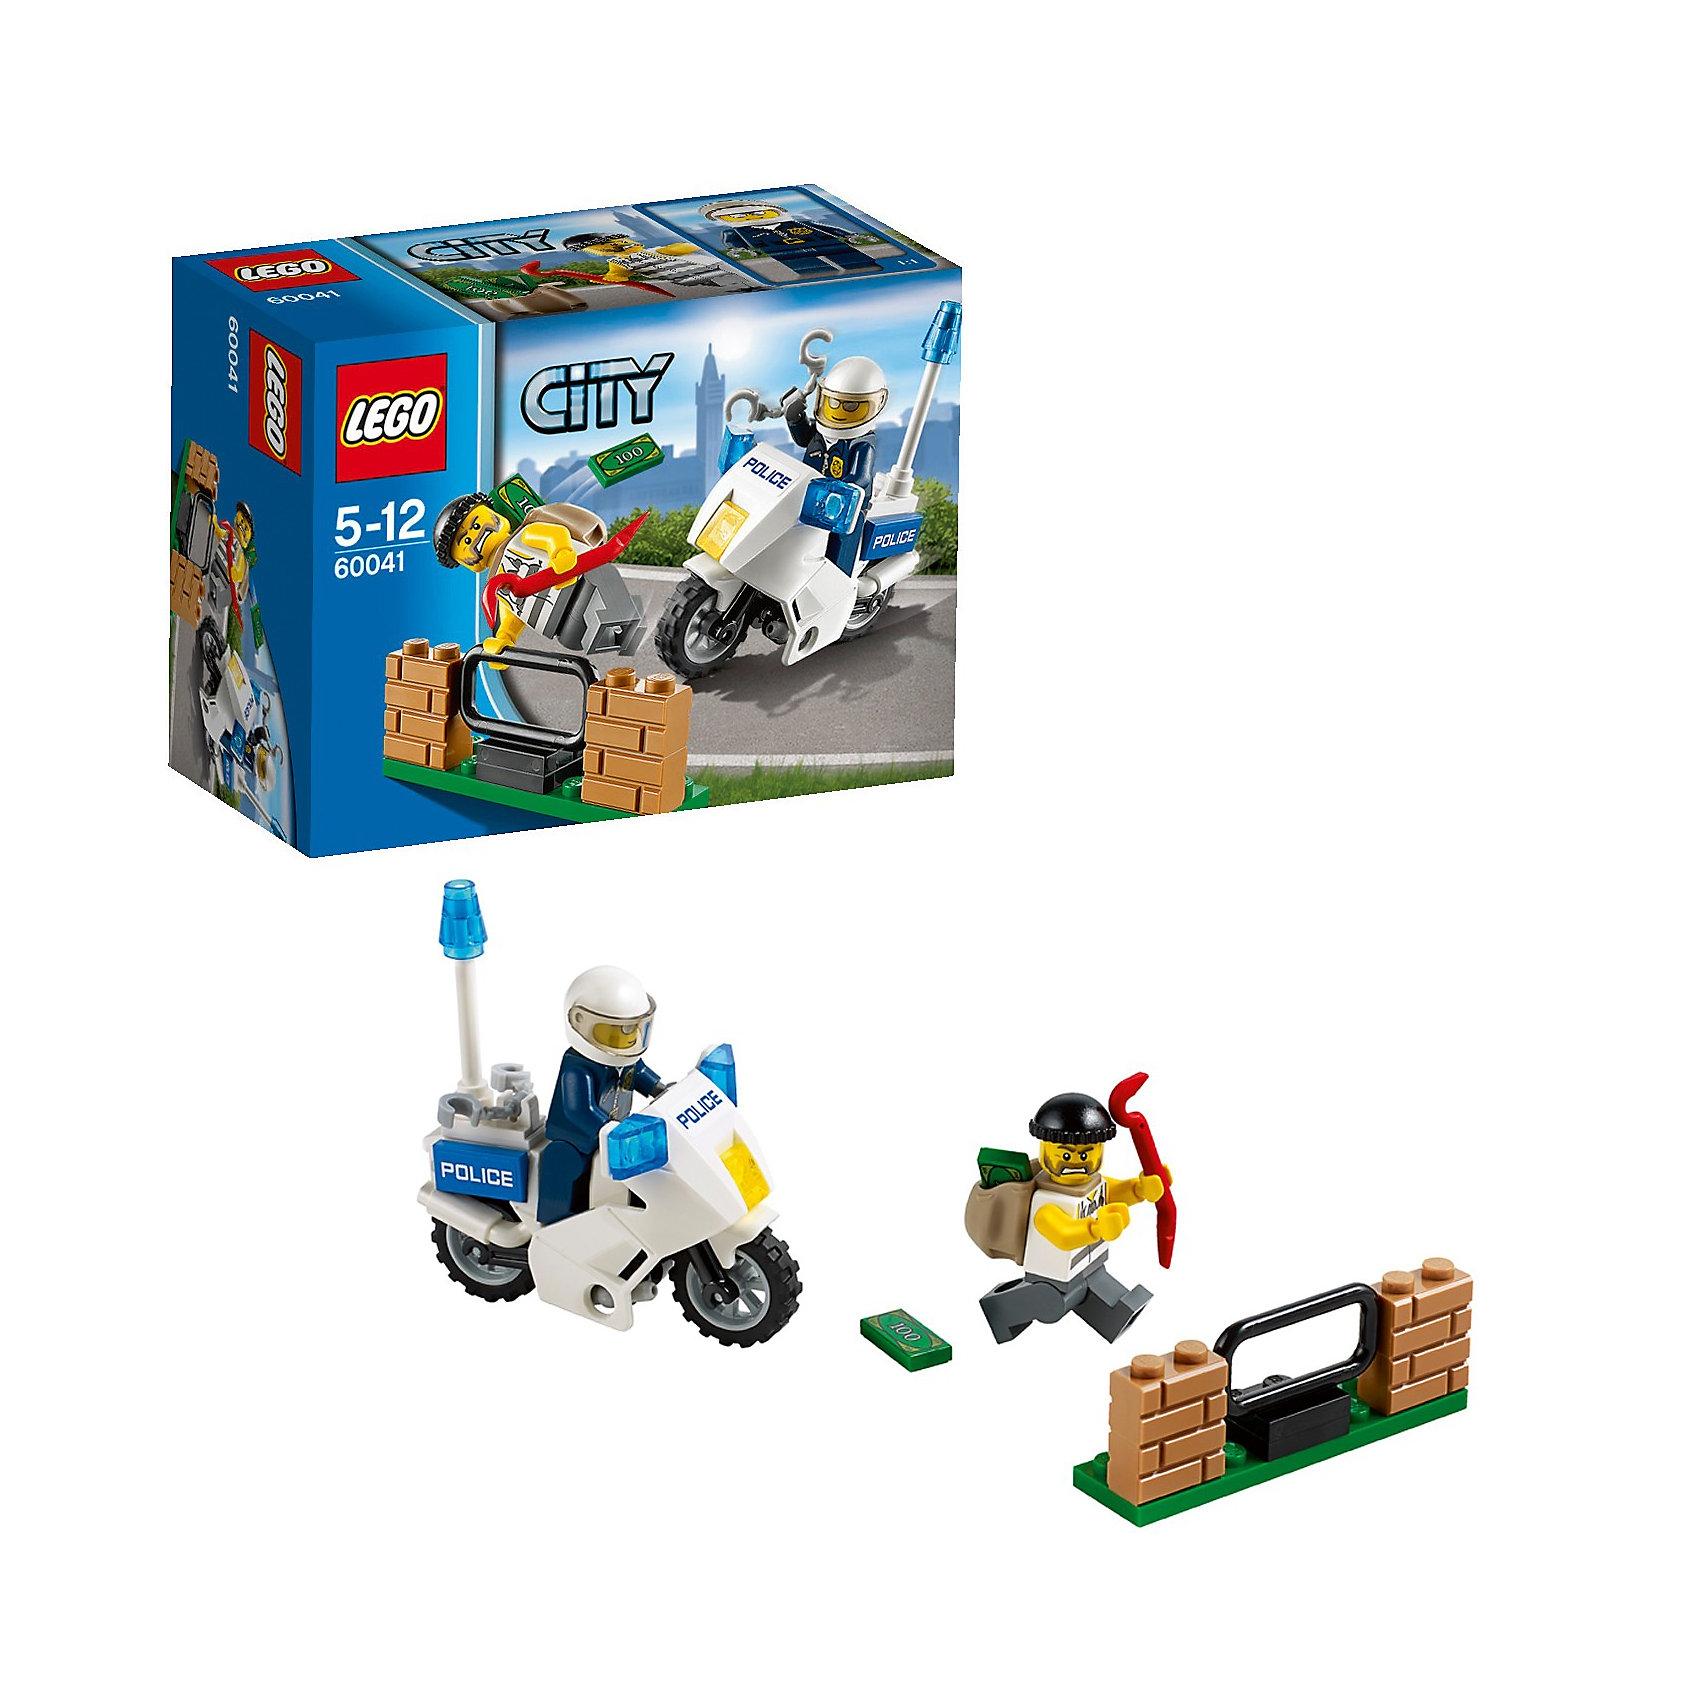 LEGO City 60041: Погоня за воришкой